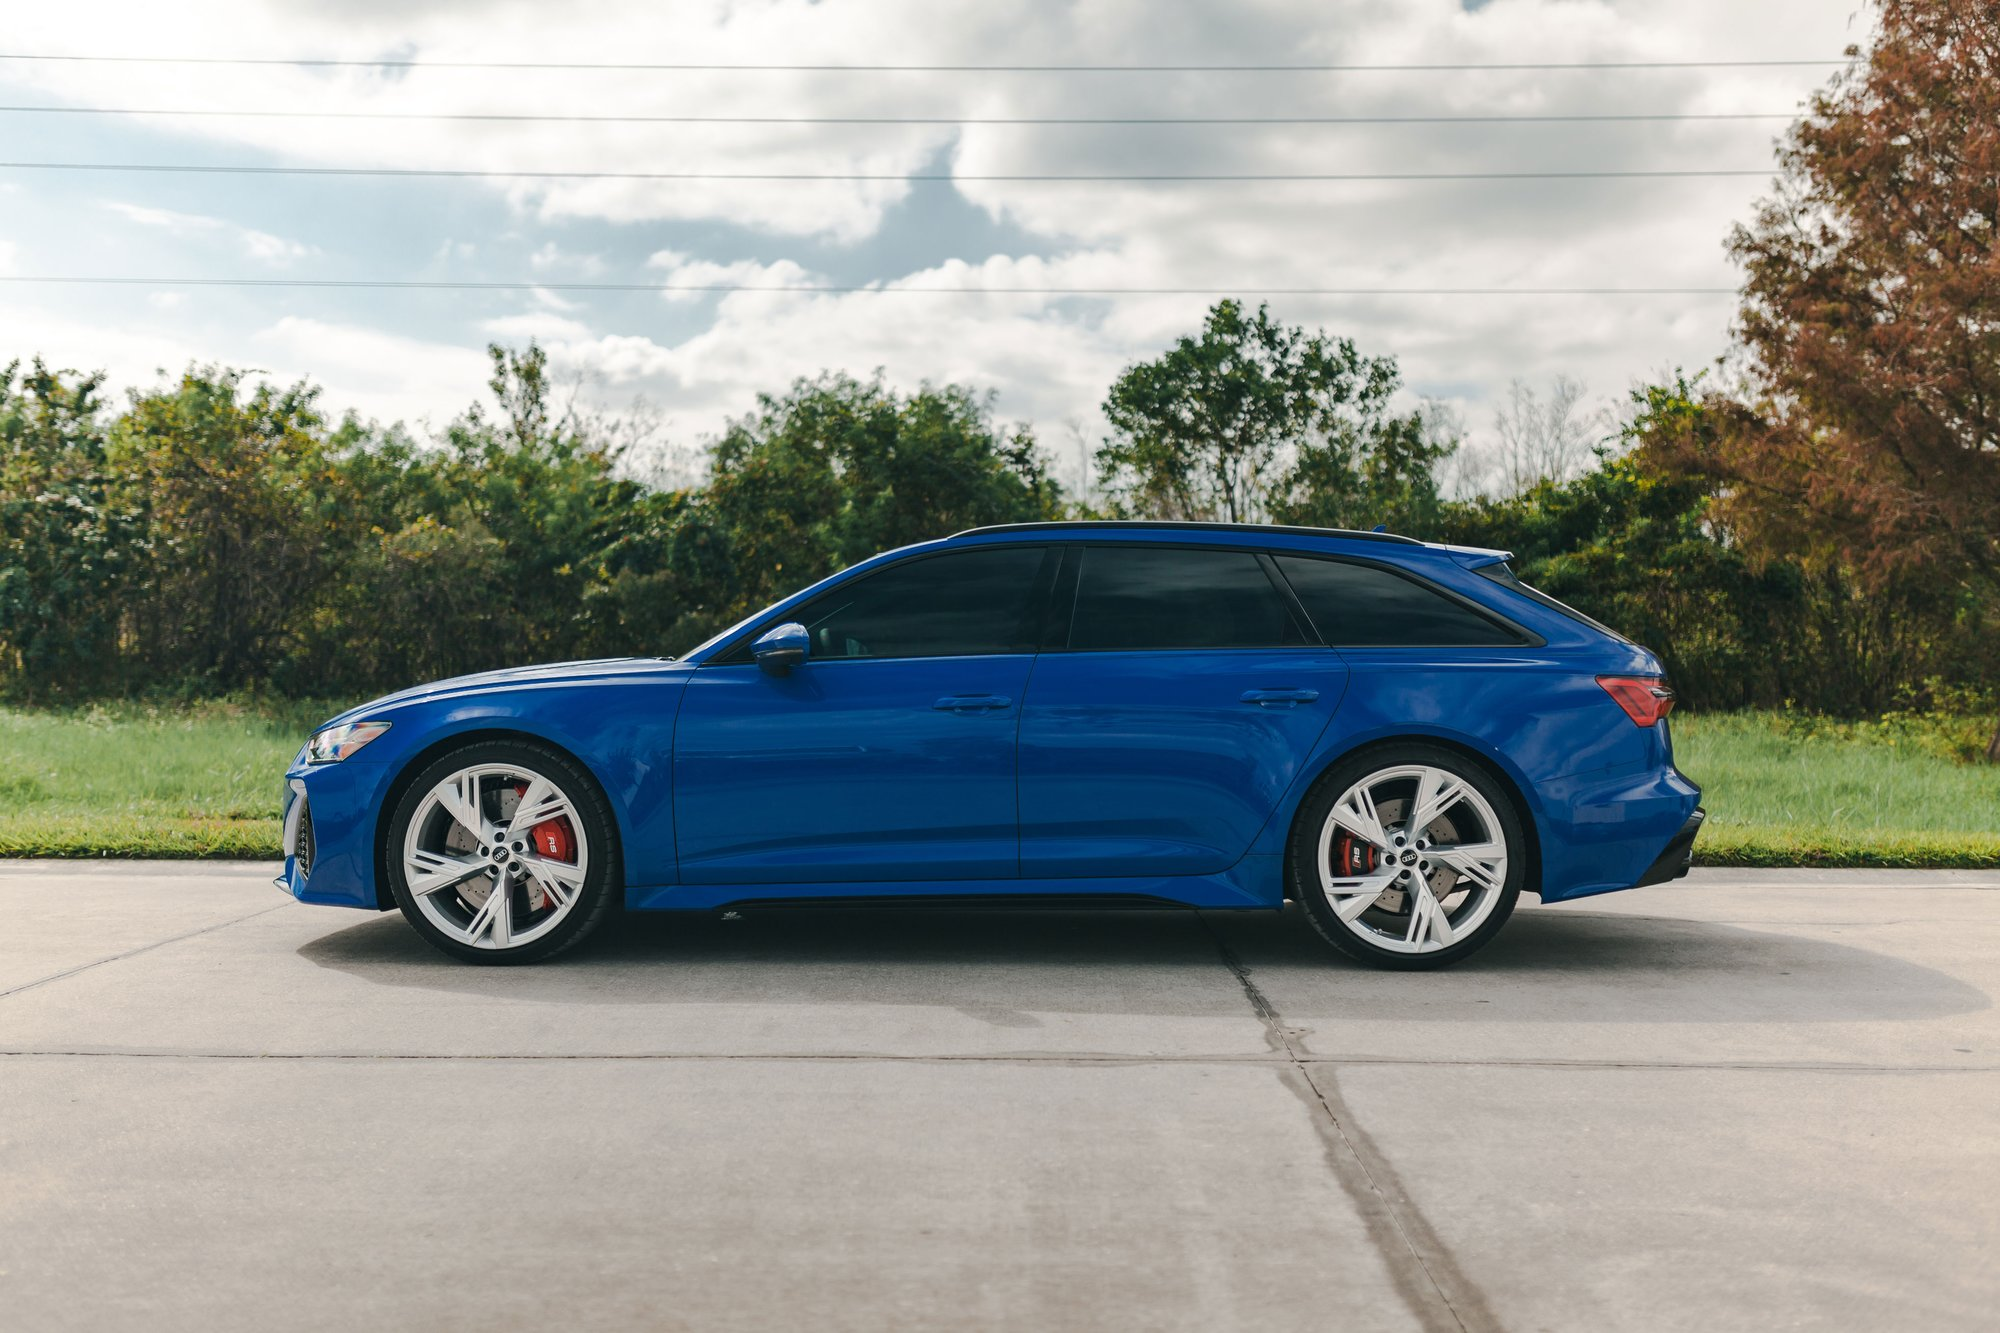 2021 Audi RS6 Avant - Nogaro Blue Tribute Edition - 1 of ...